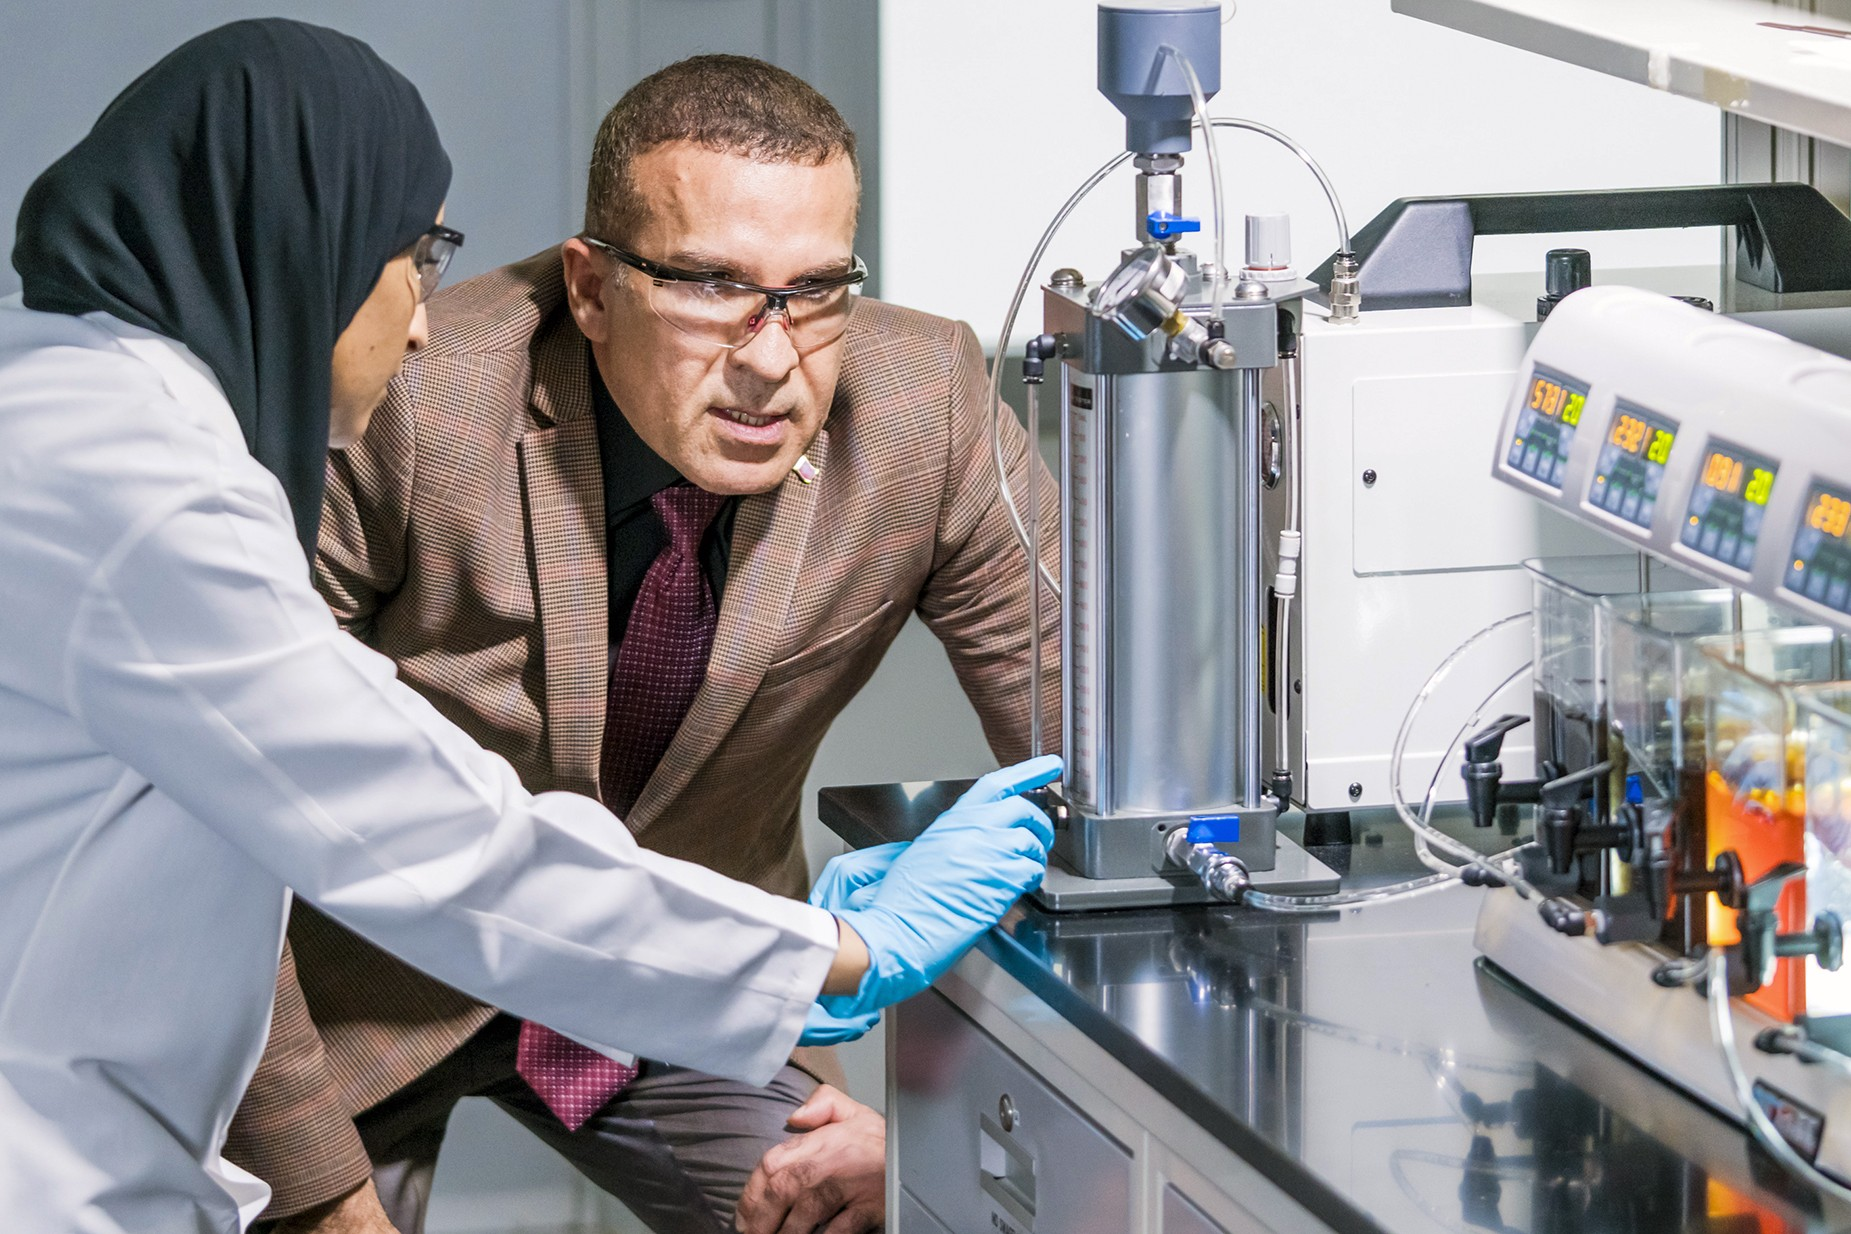 Mashael Al-Maas and Samer Adham looking at testing equipment in laboratory